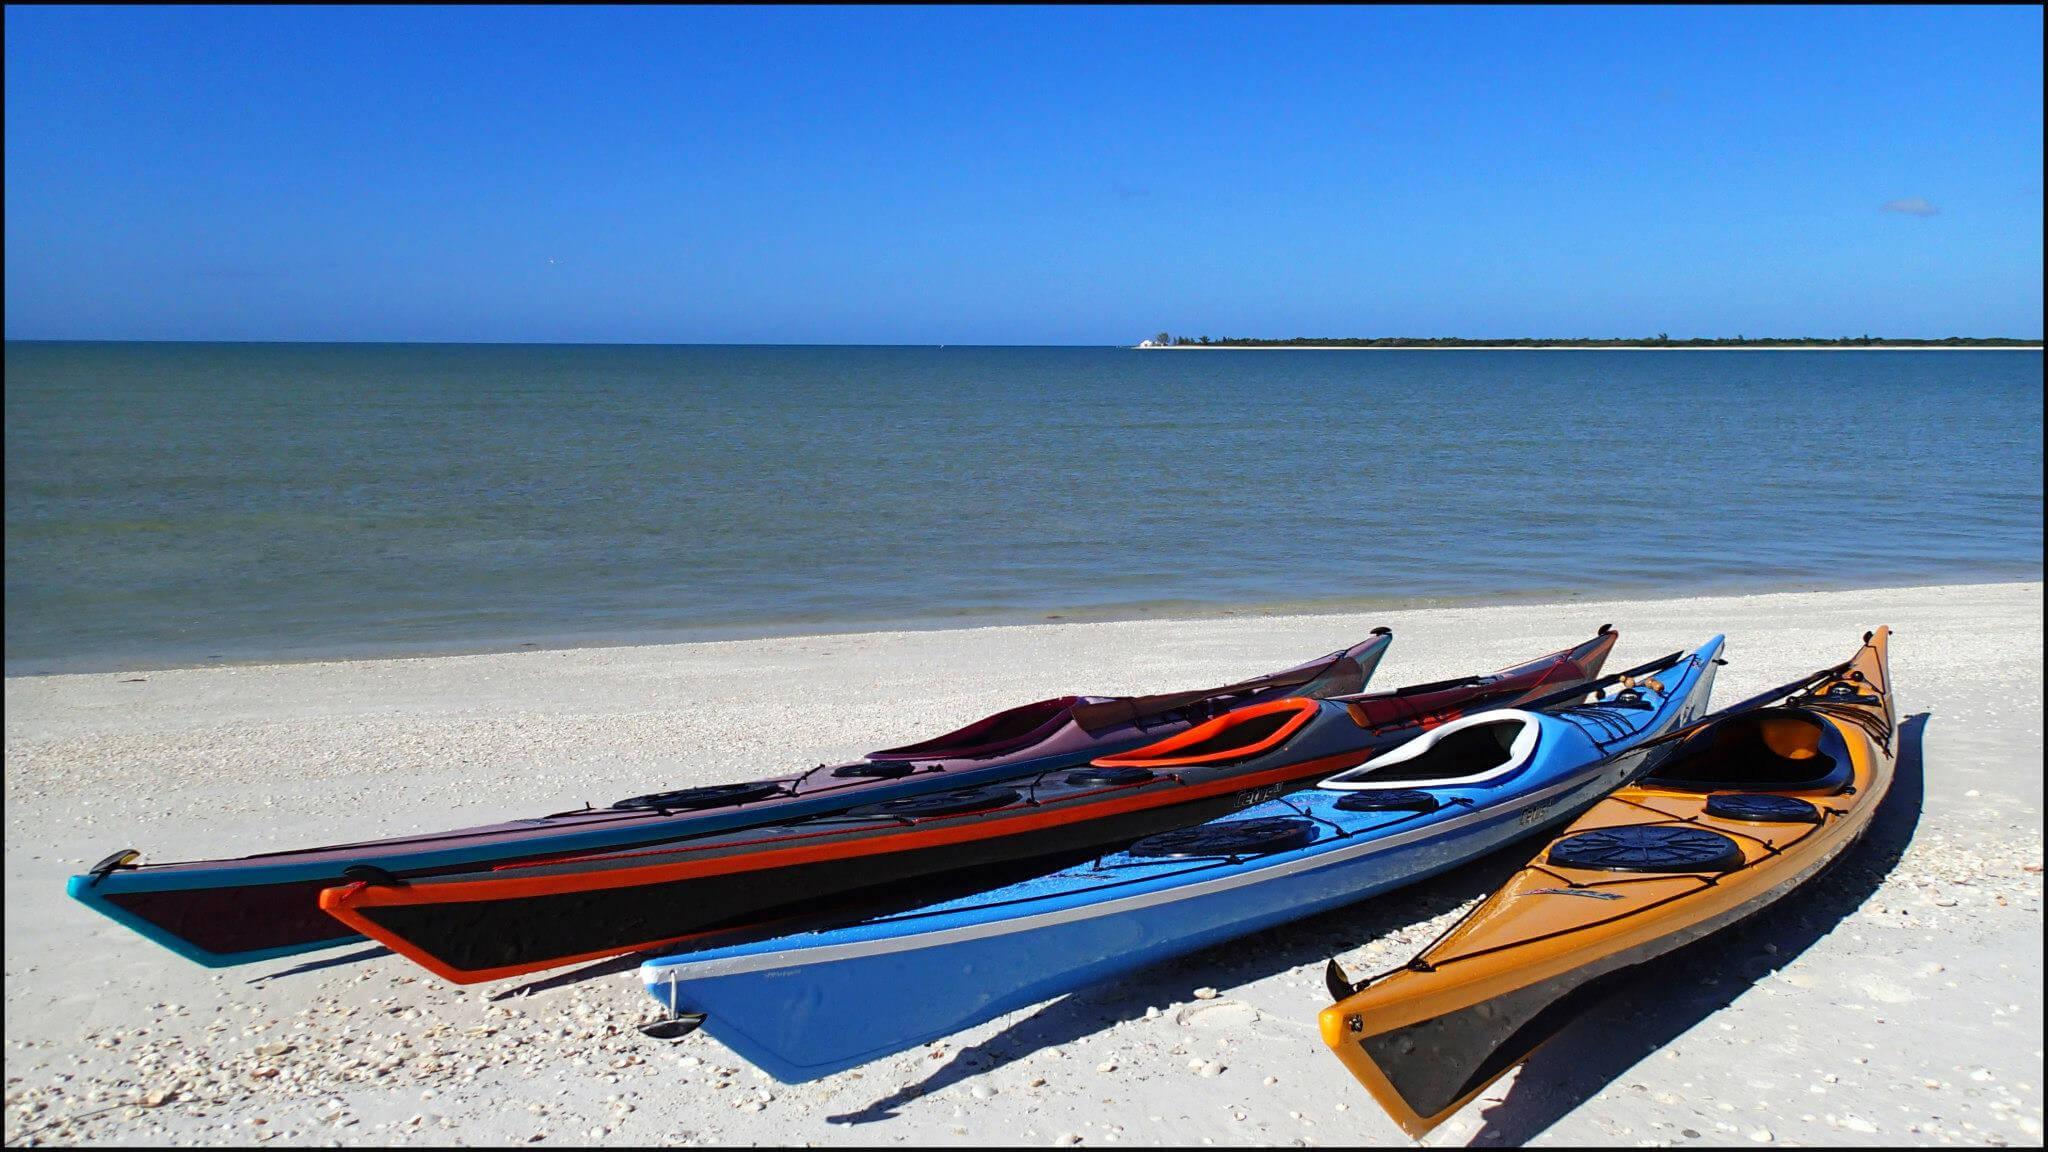 2017 Top 4 Best Sea Kayaks All Outdoors